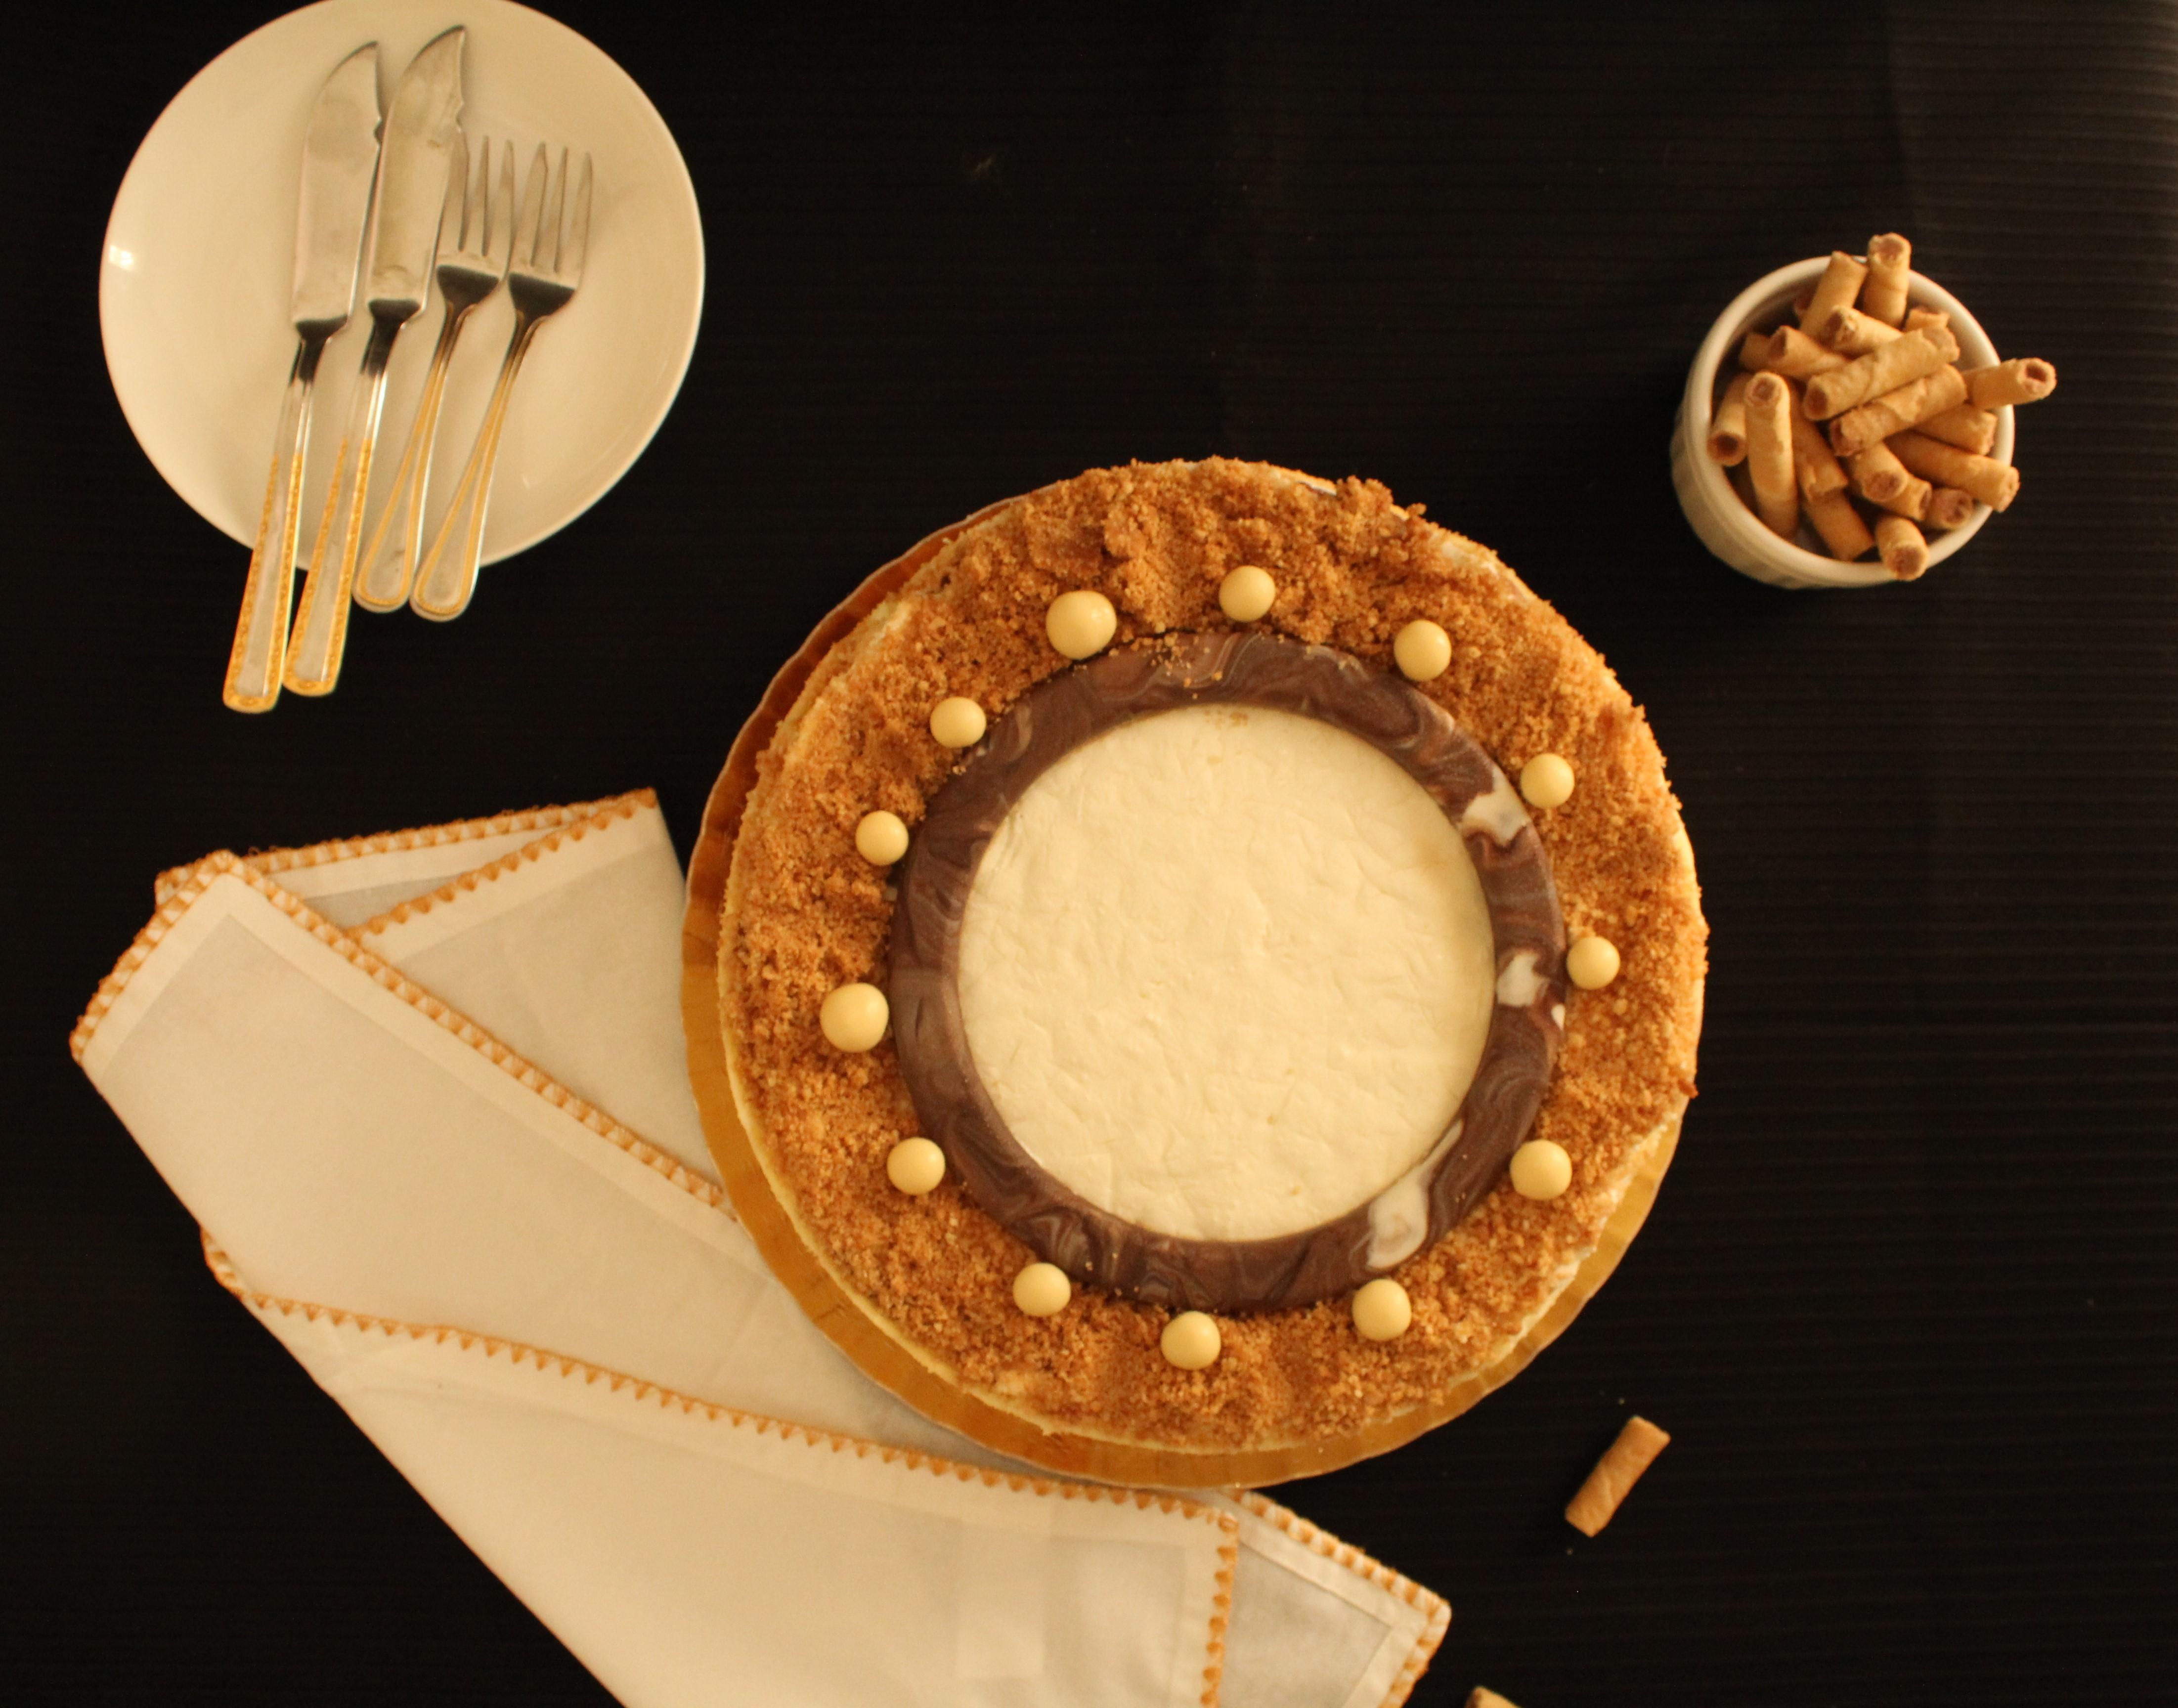 IMG 8290 - עוגת גבינה גבוהה וטעימה